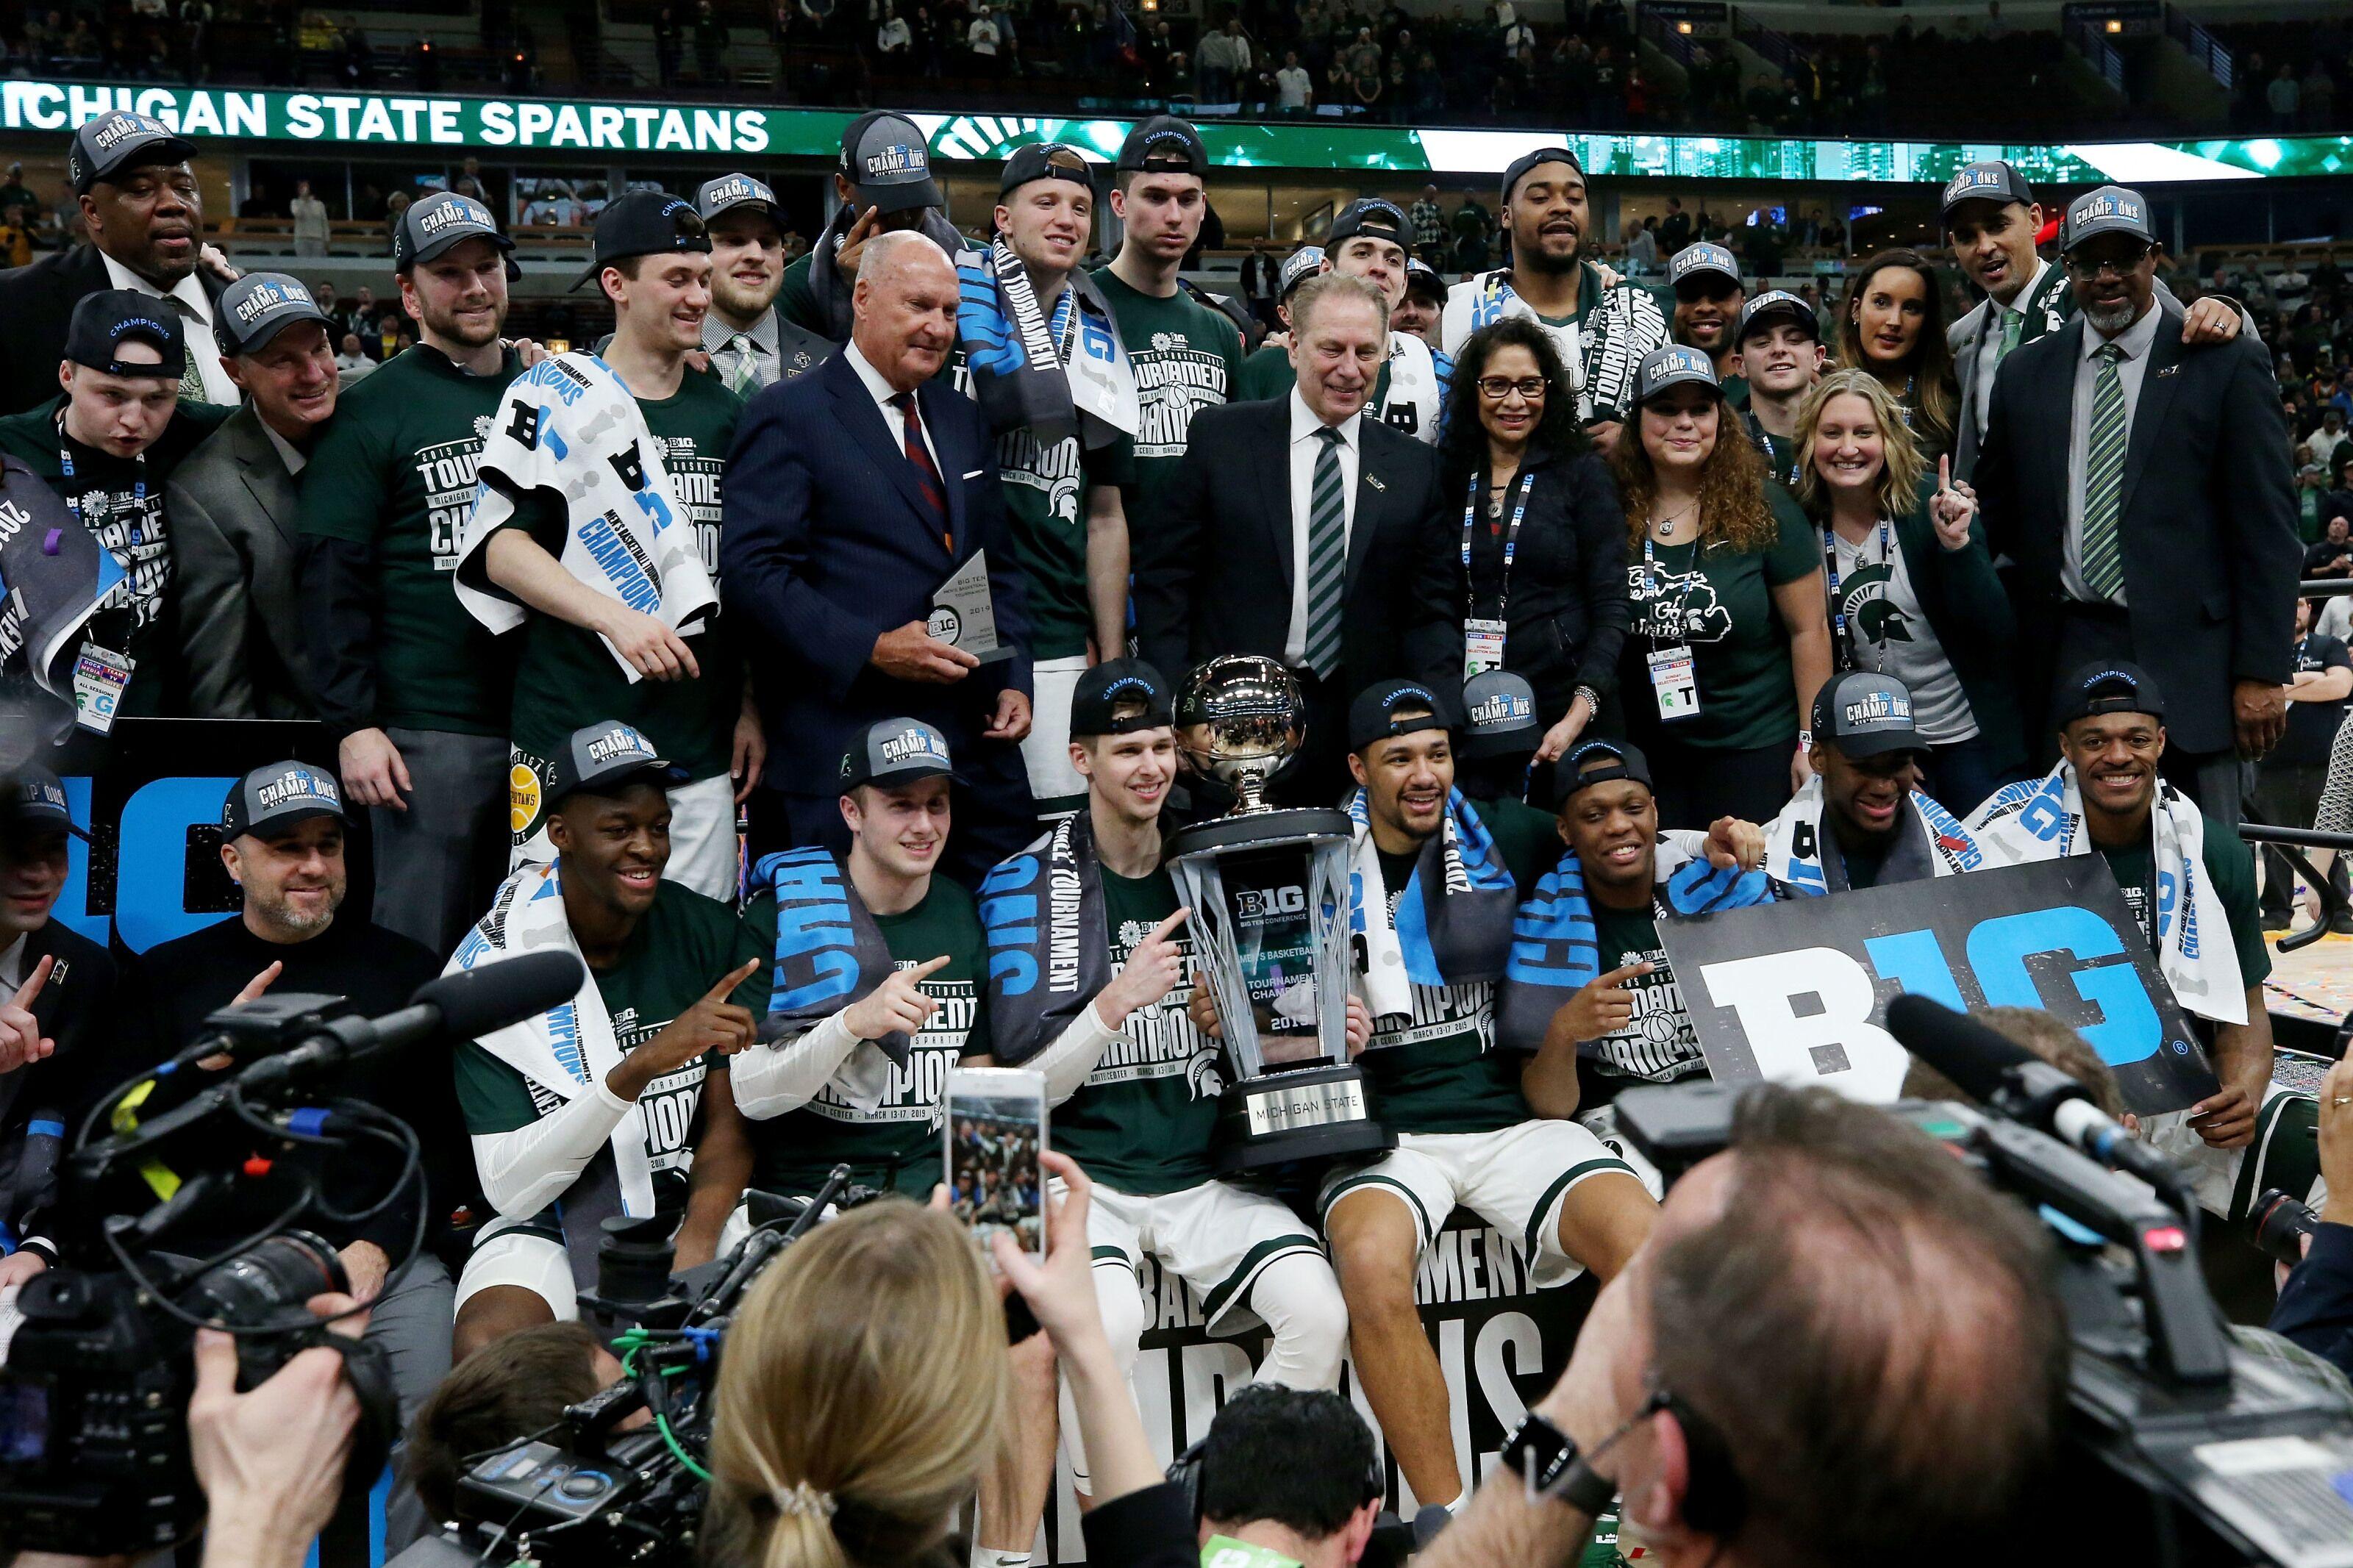 Bradley Basketball: 3 Keys to Upsetting Michigan State in Round of 64